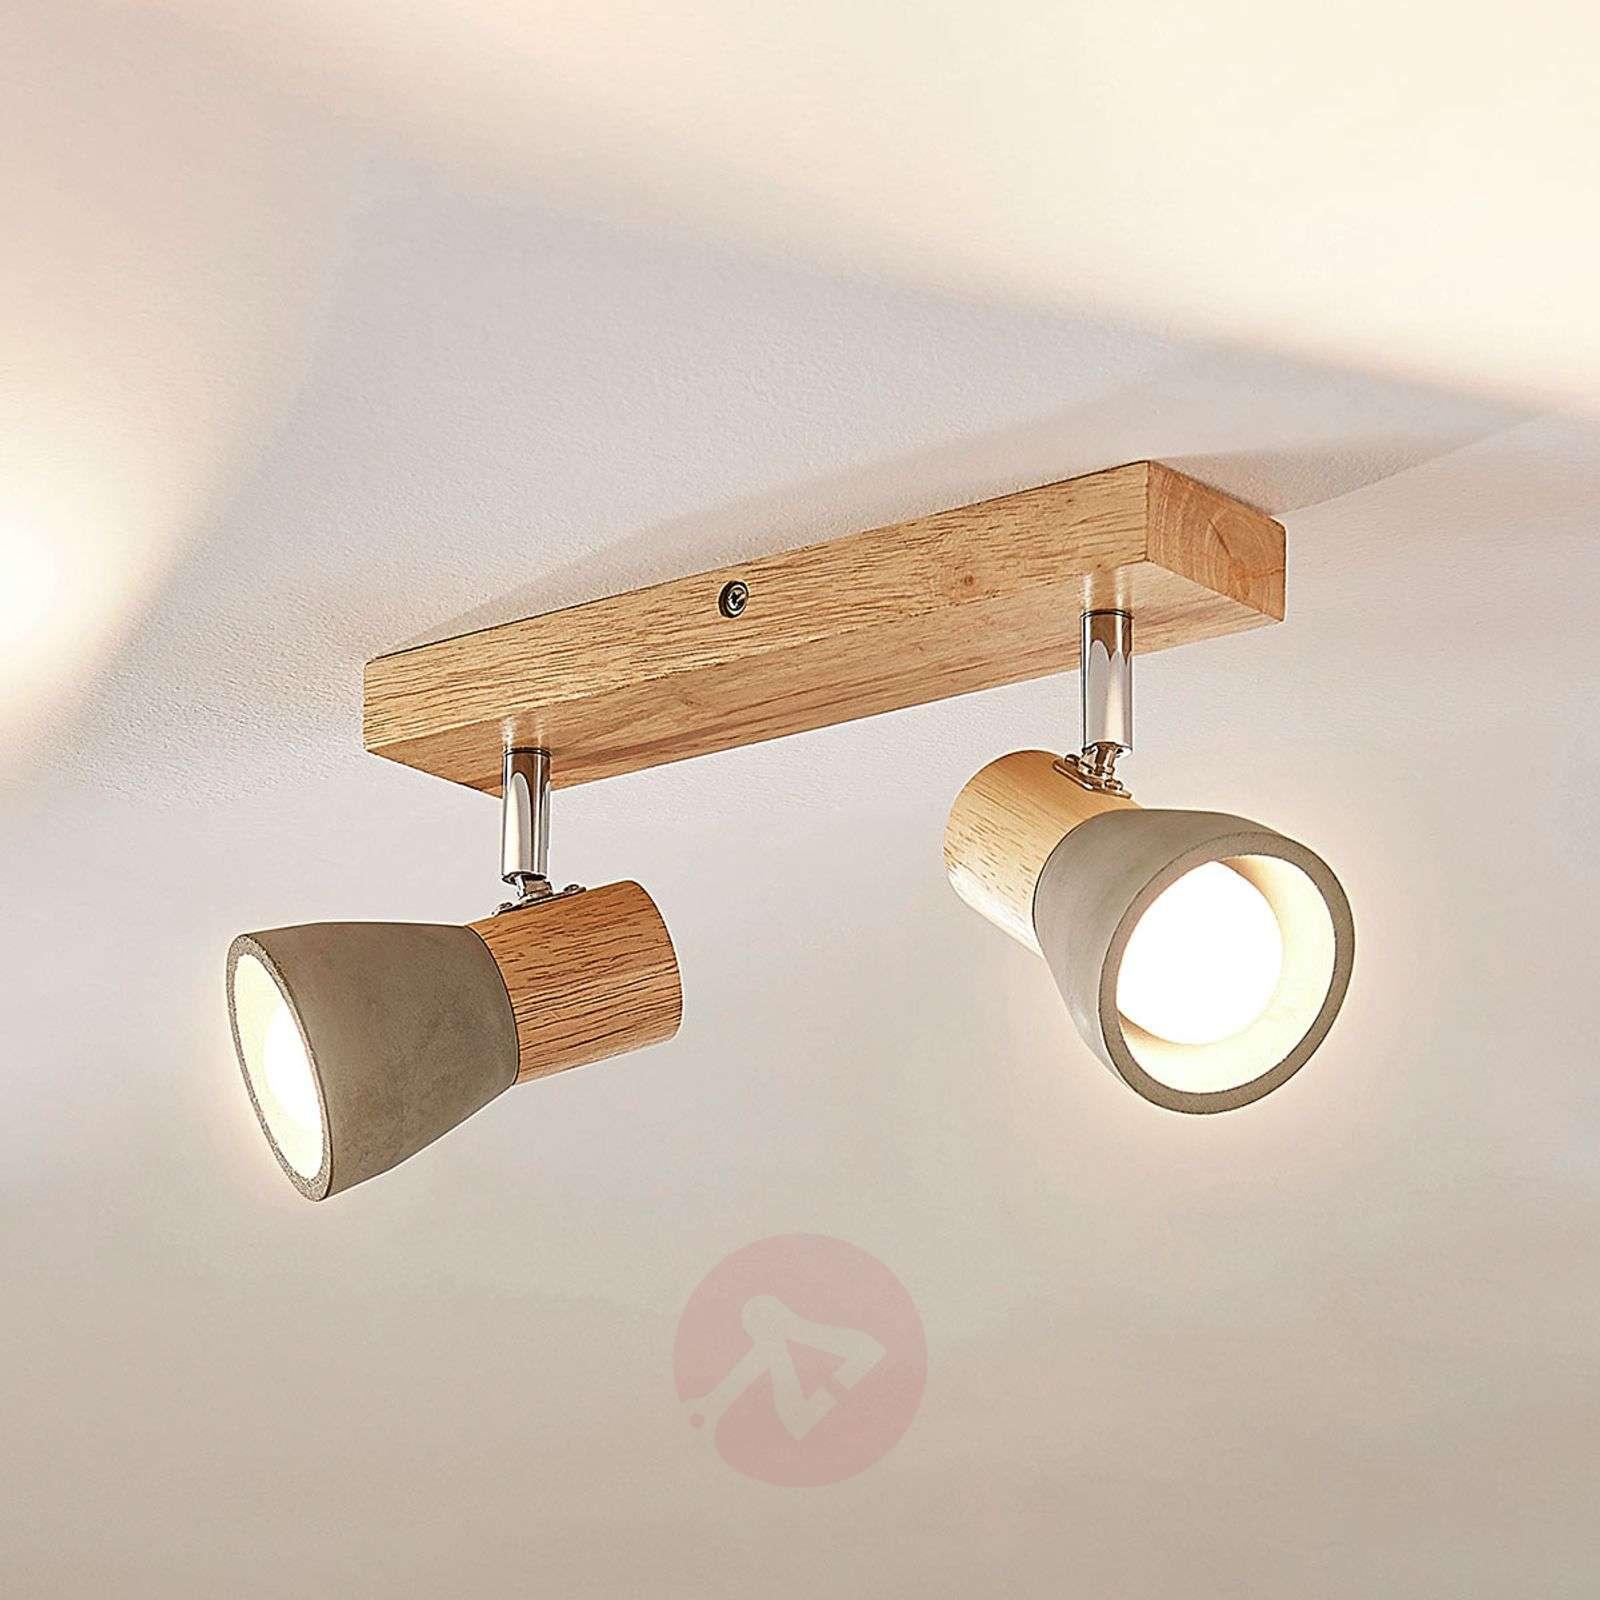 Betoni-puu-kattovalaisin Filiz LED-lampuilla-9621837-01